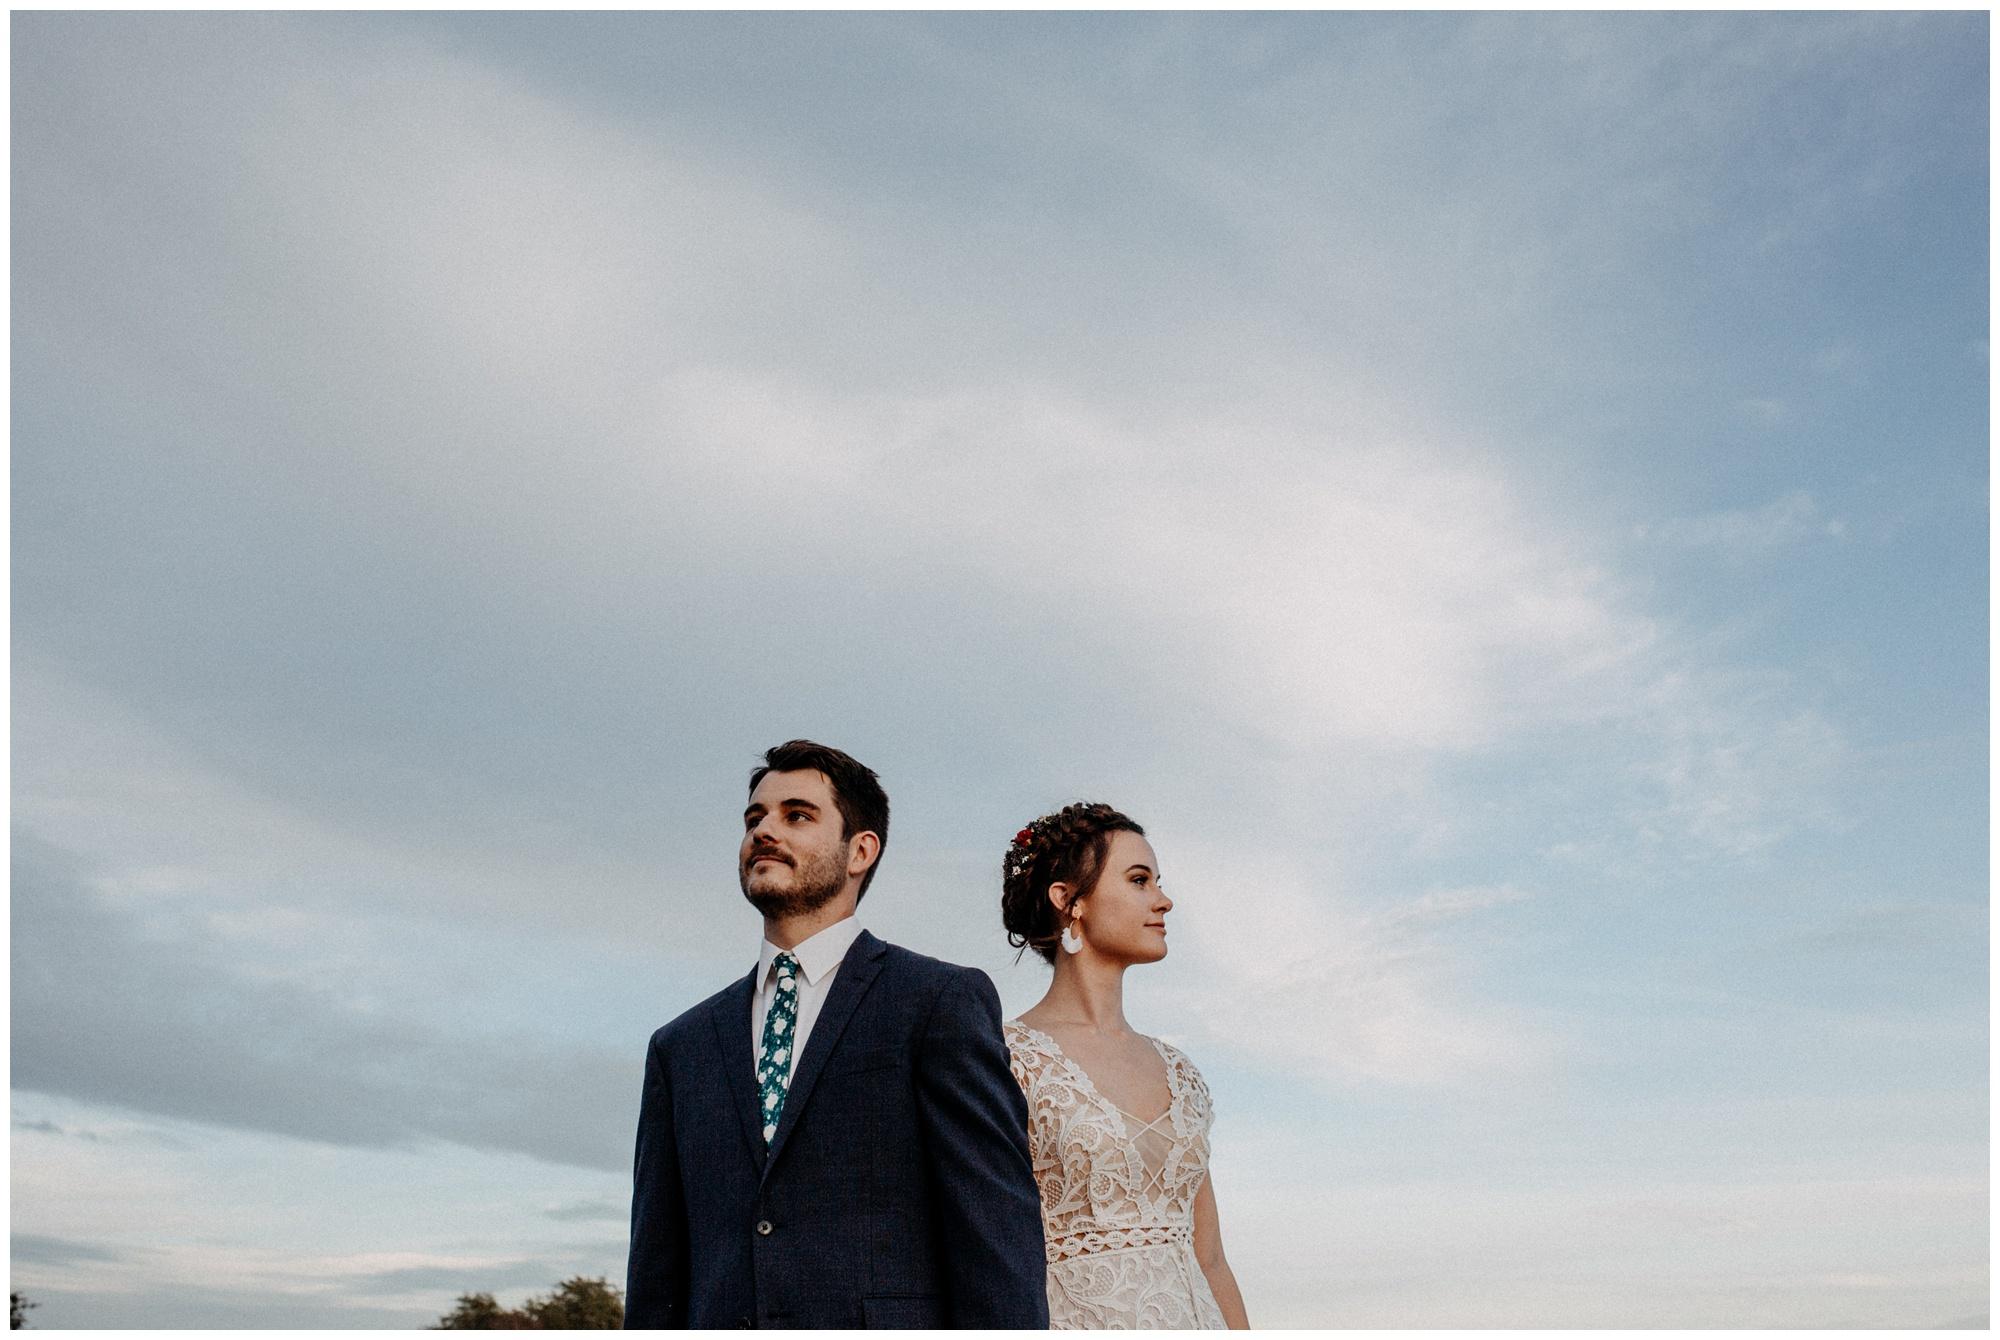 AUSTIN-TEXAS-PROSPECT-HOUSE-WEDDING-VENUE-PHOTOGRAPHY25832.JPG